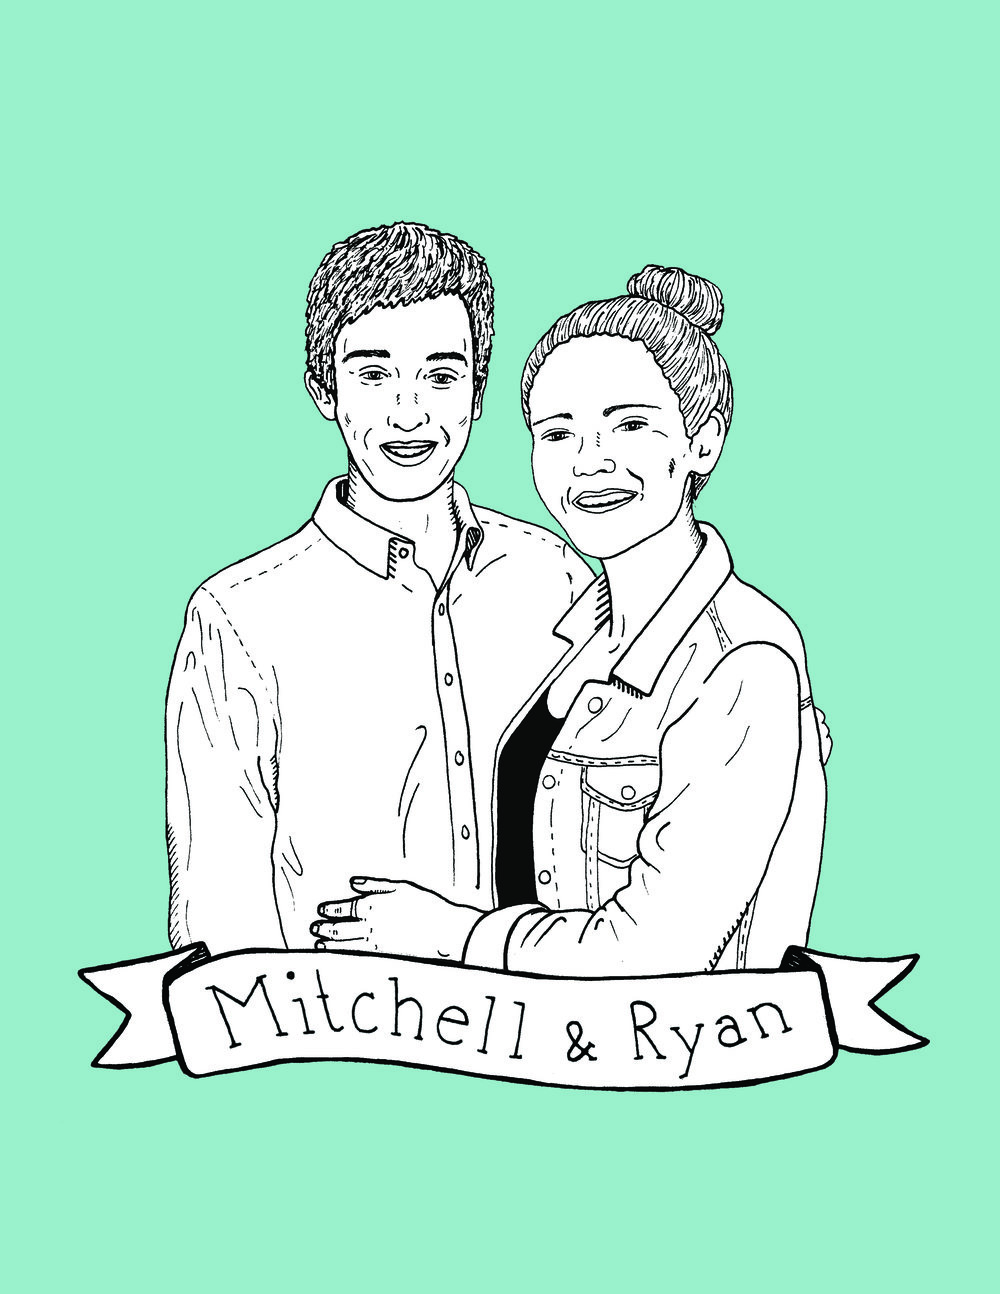 Mitchel&Ryan.jpg